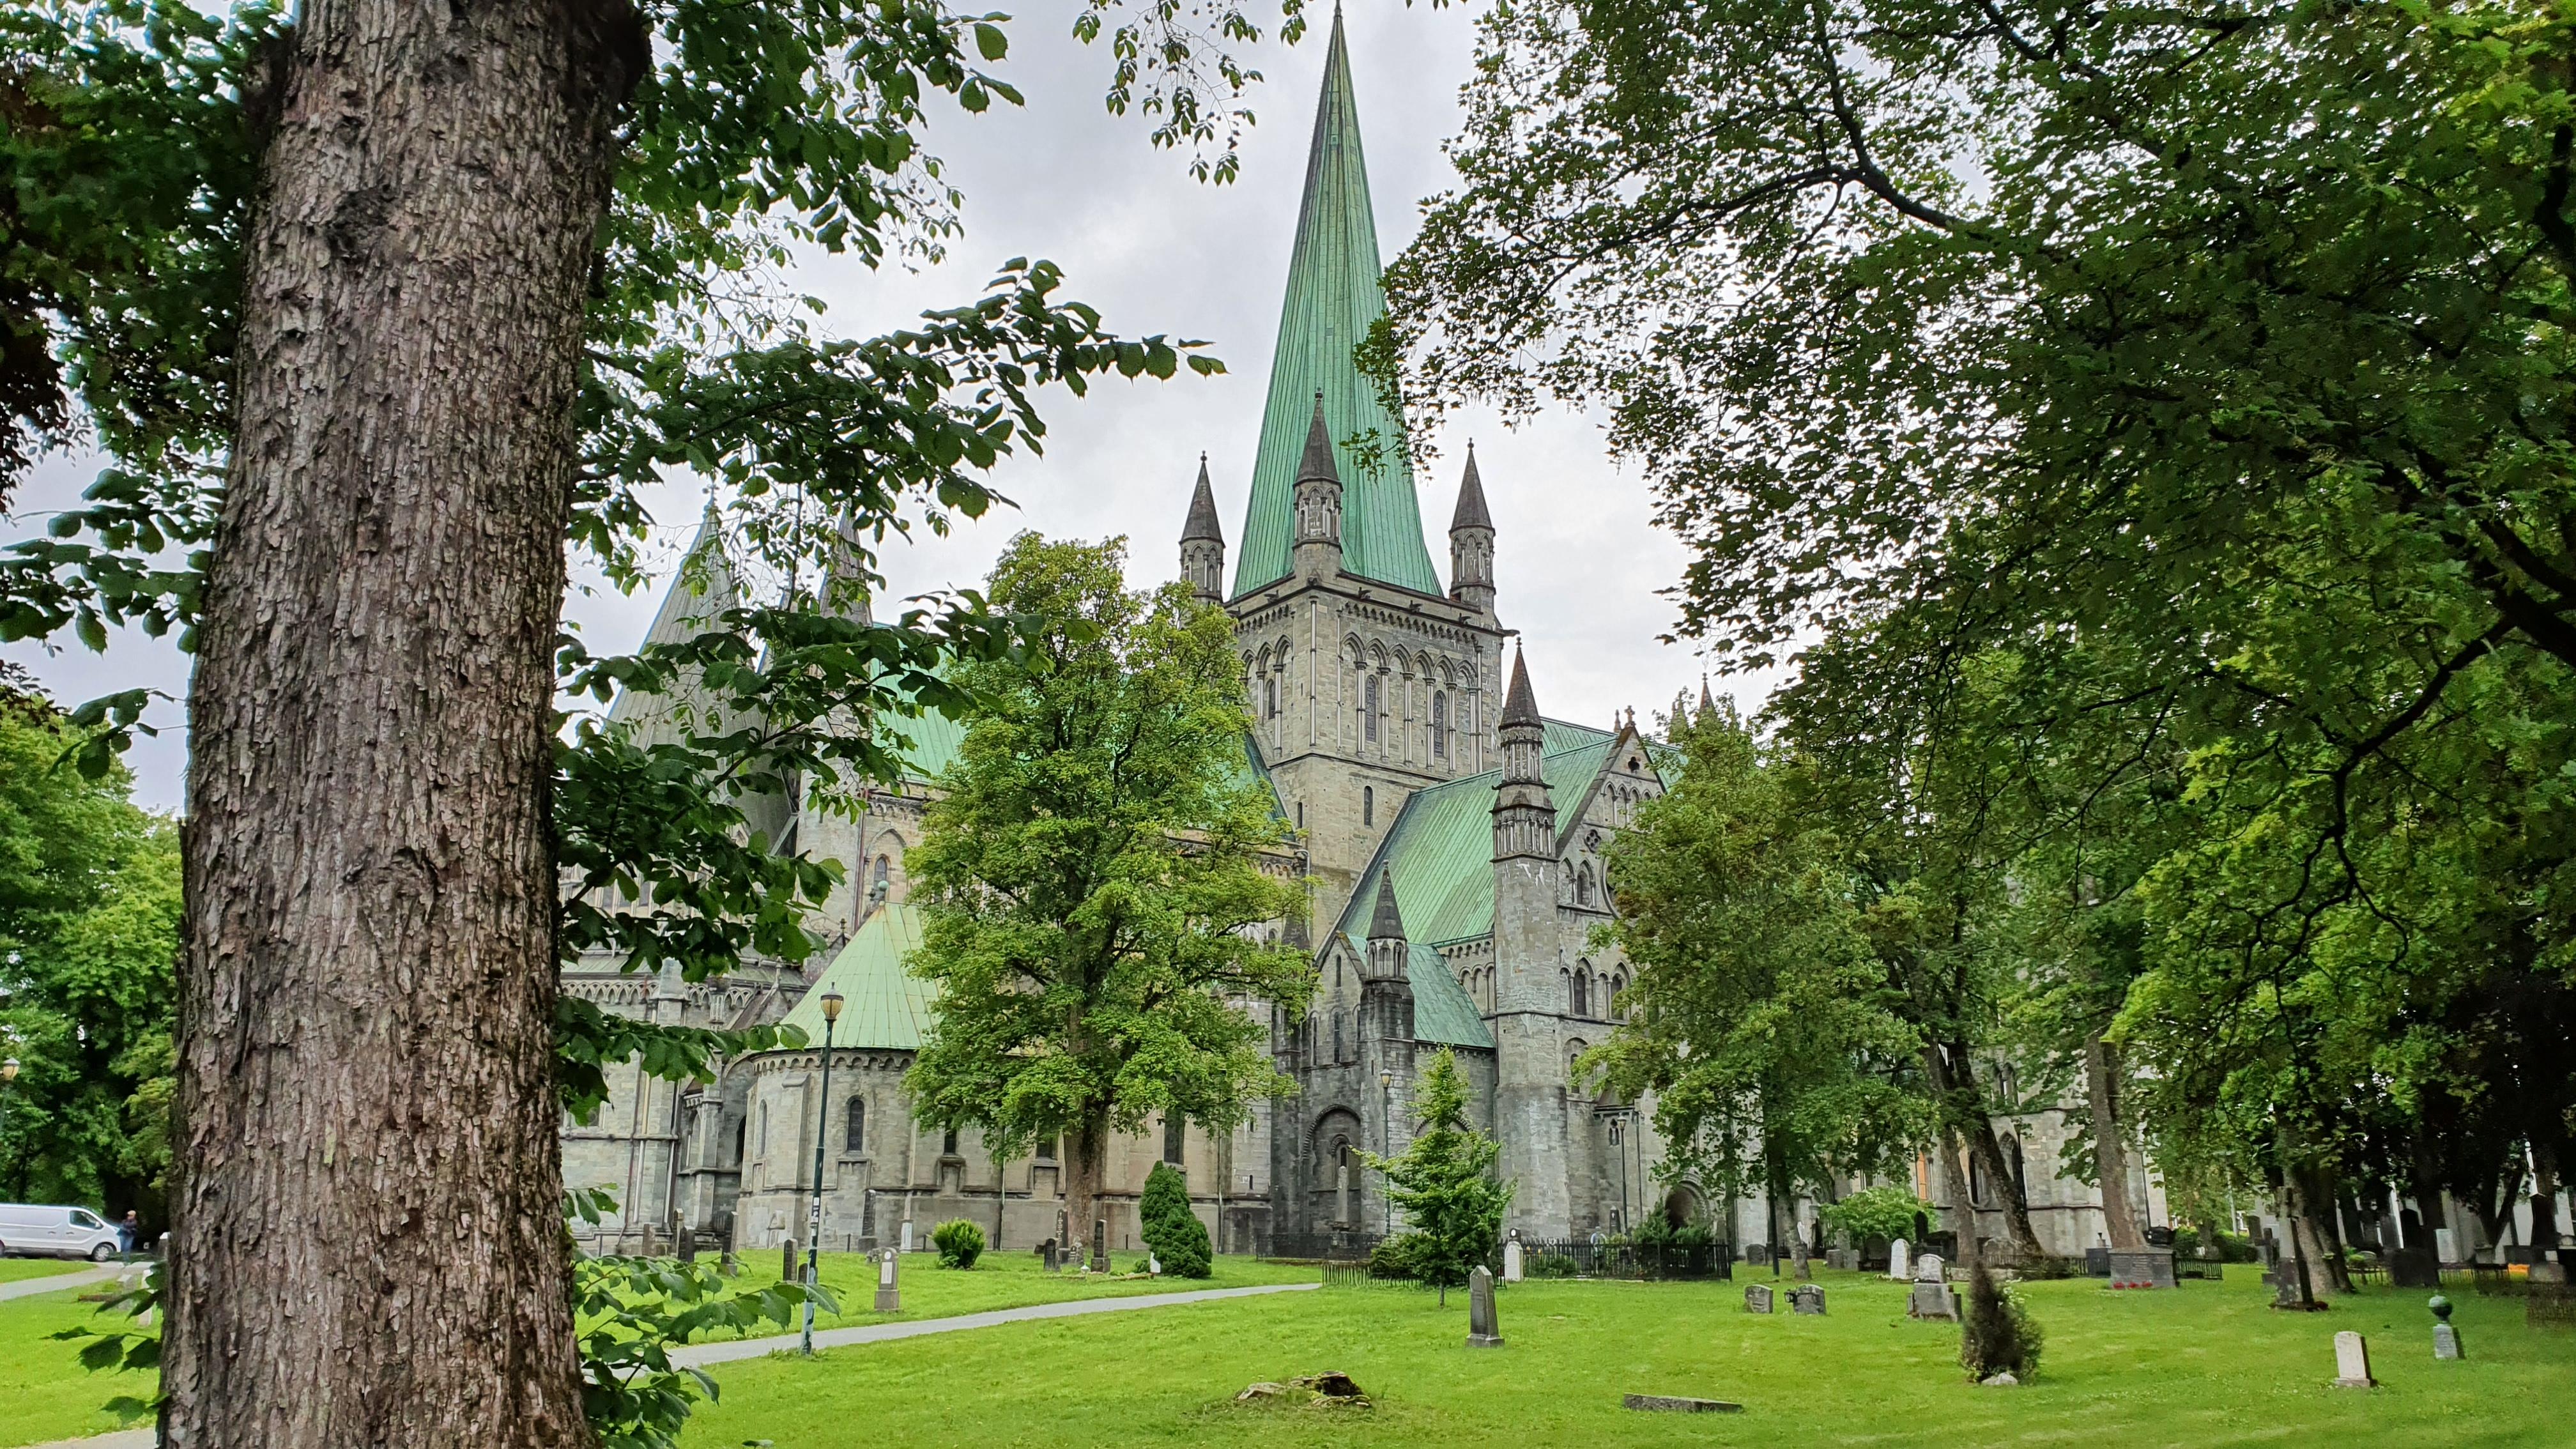 Trondheim landsmøte 3